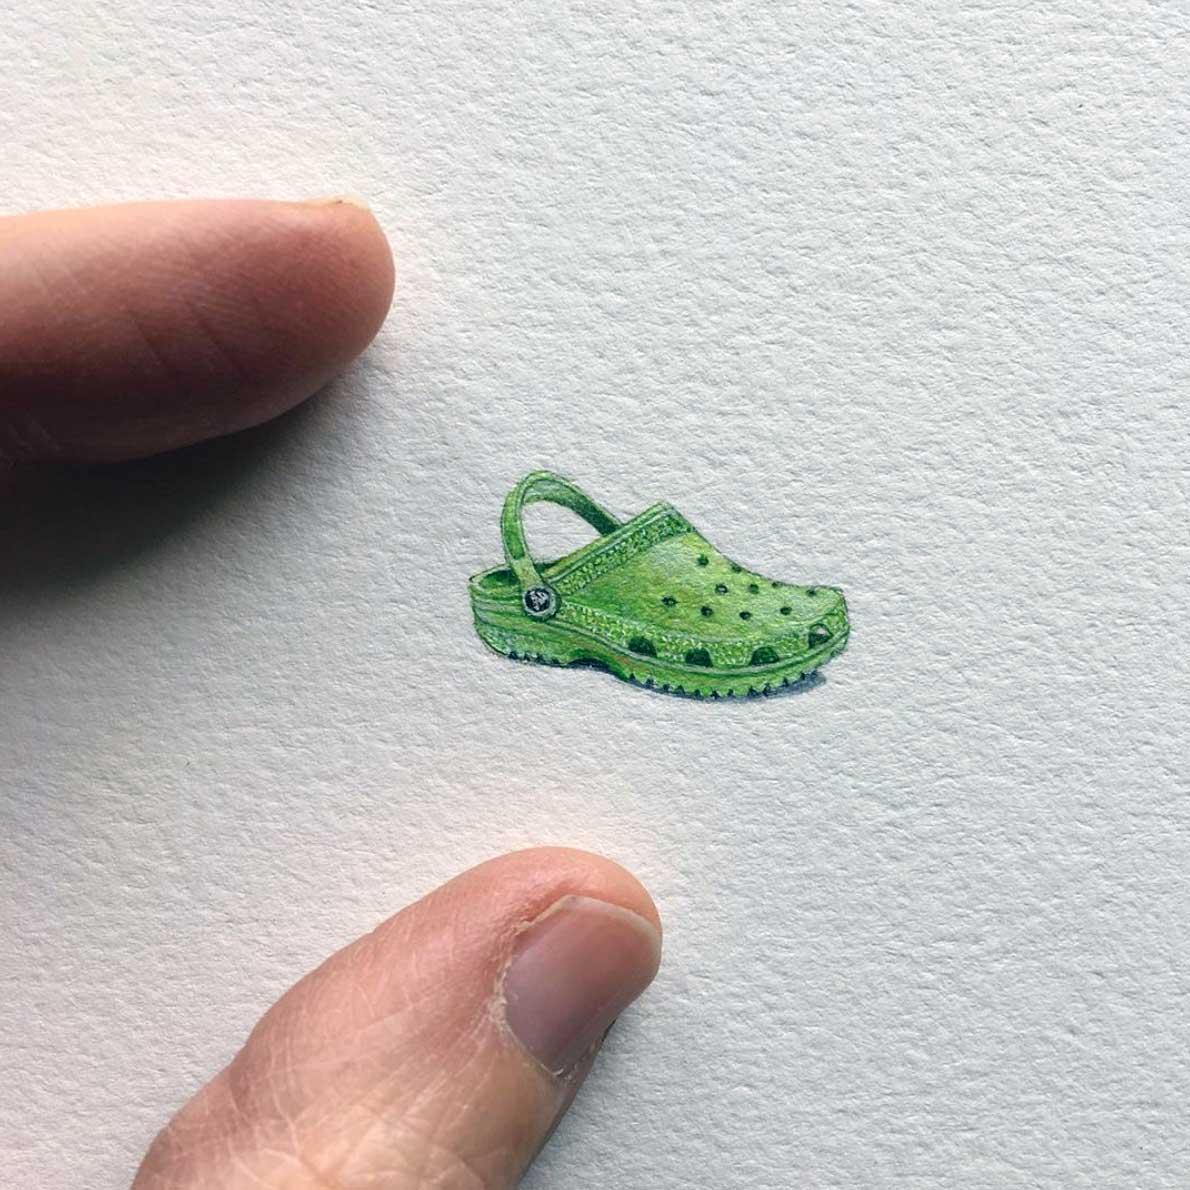 Miniatur-Gemälde von Brooke Rothshank Brooke-Rothshank-miniatur-malerei_06